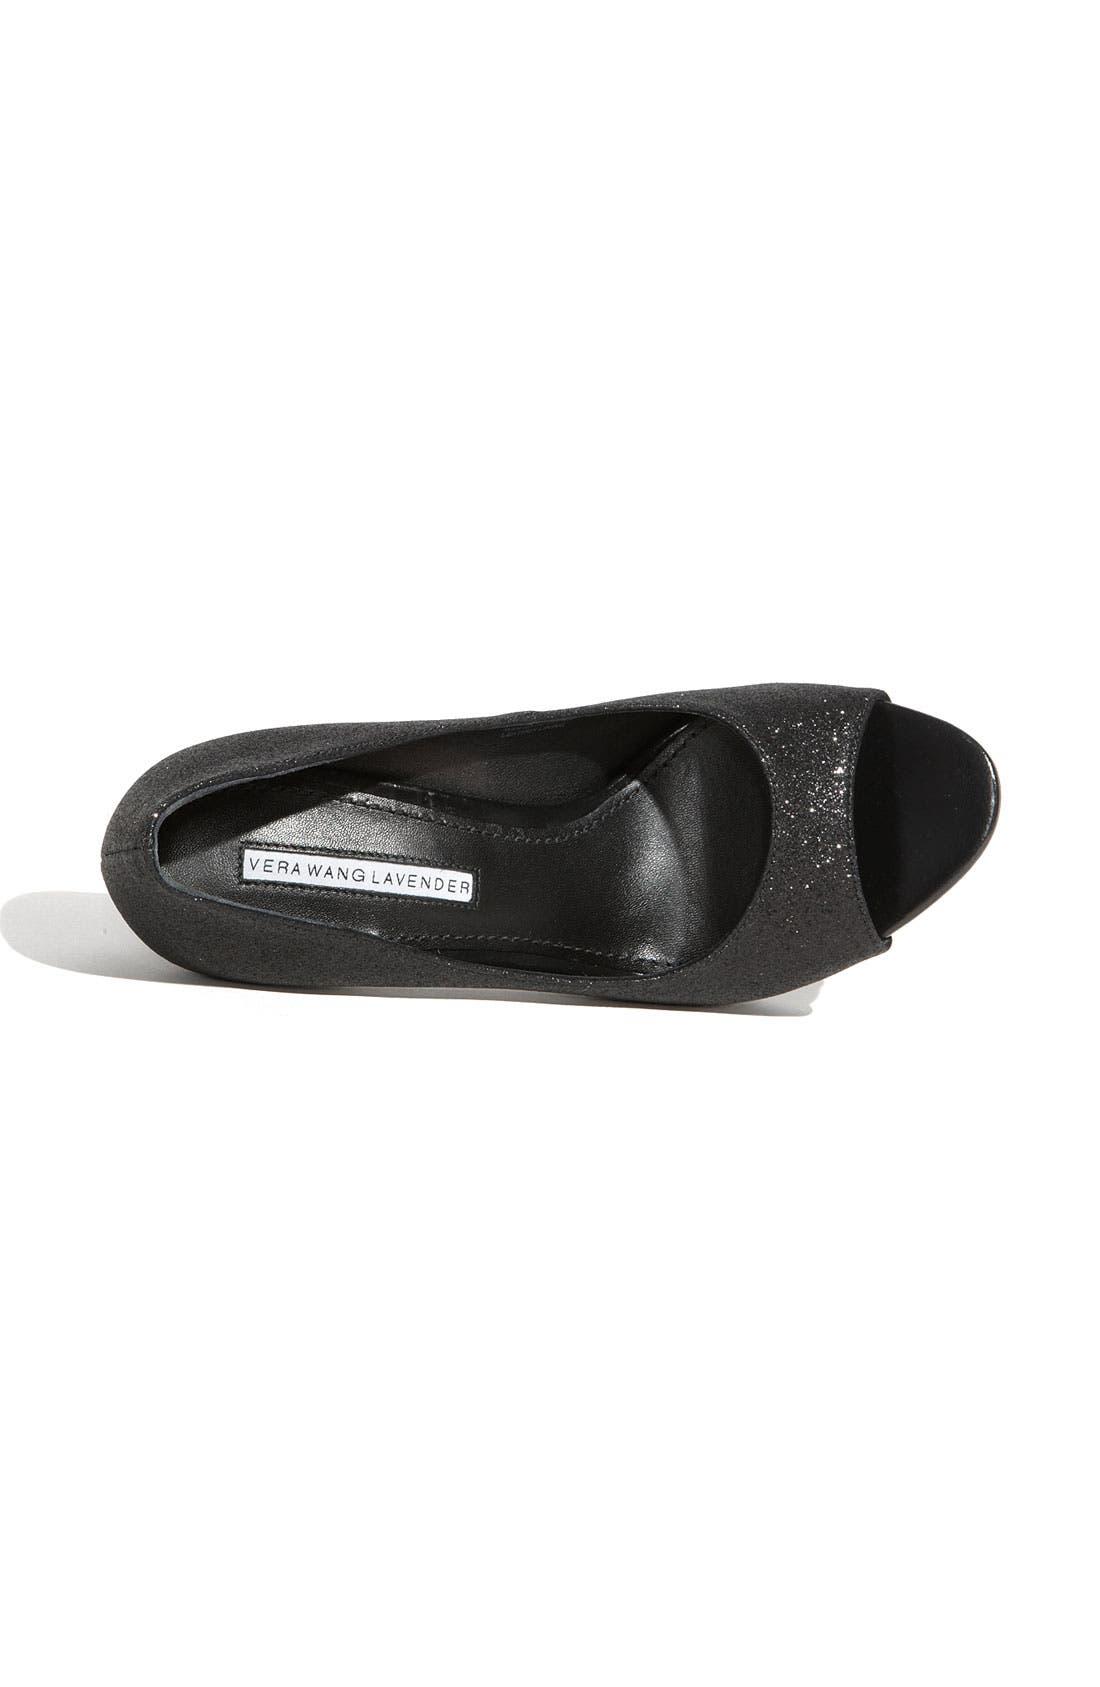 Footwear 'Selima' Peep Toe Pump,                             Alternate thumbnail 14, color,